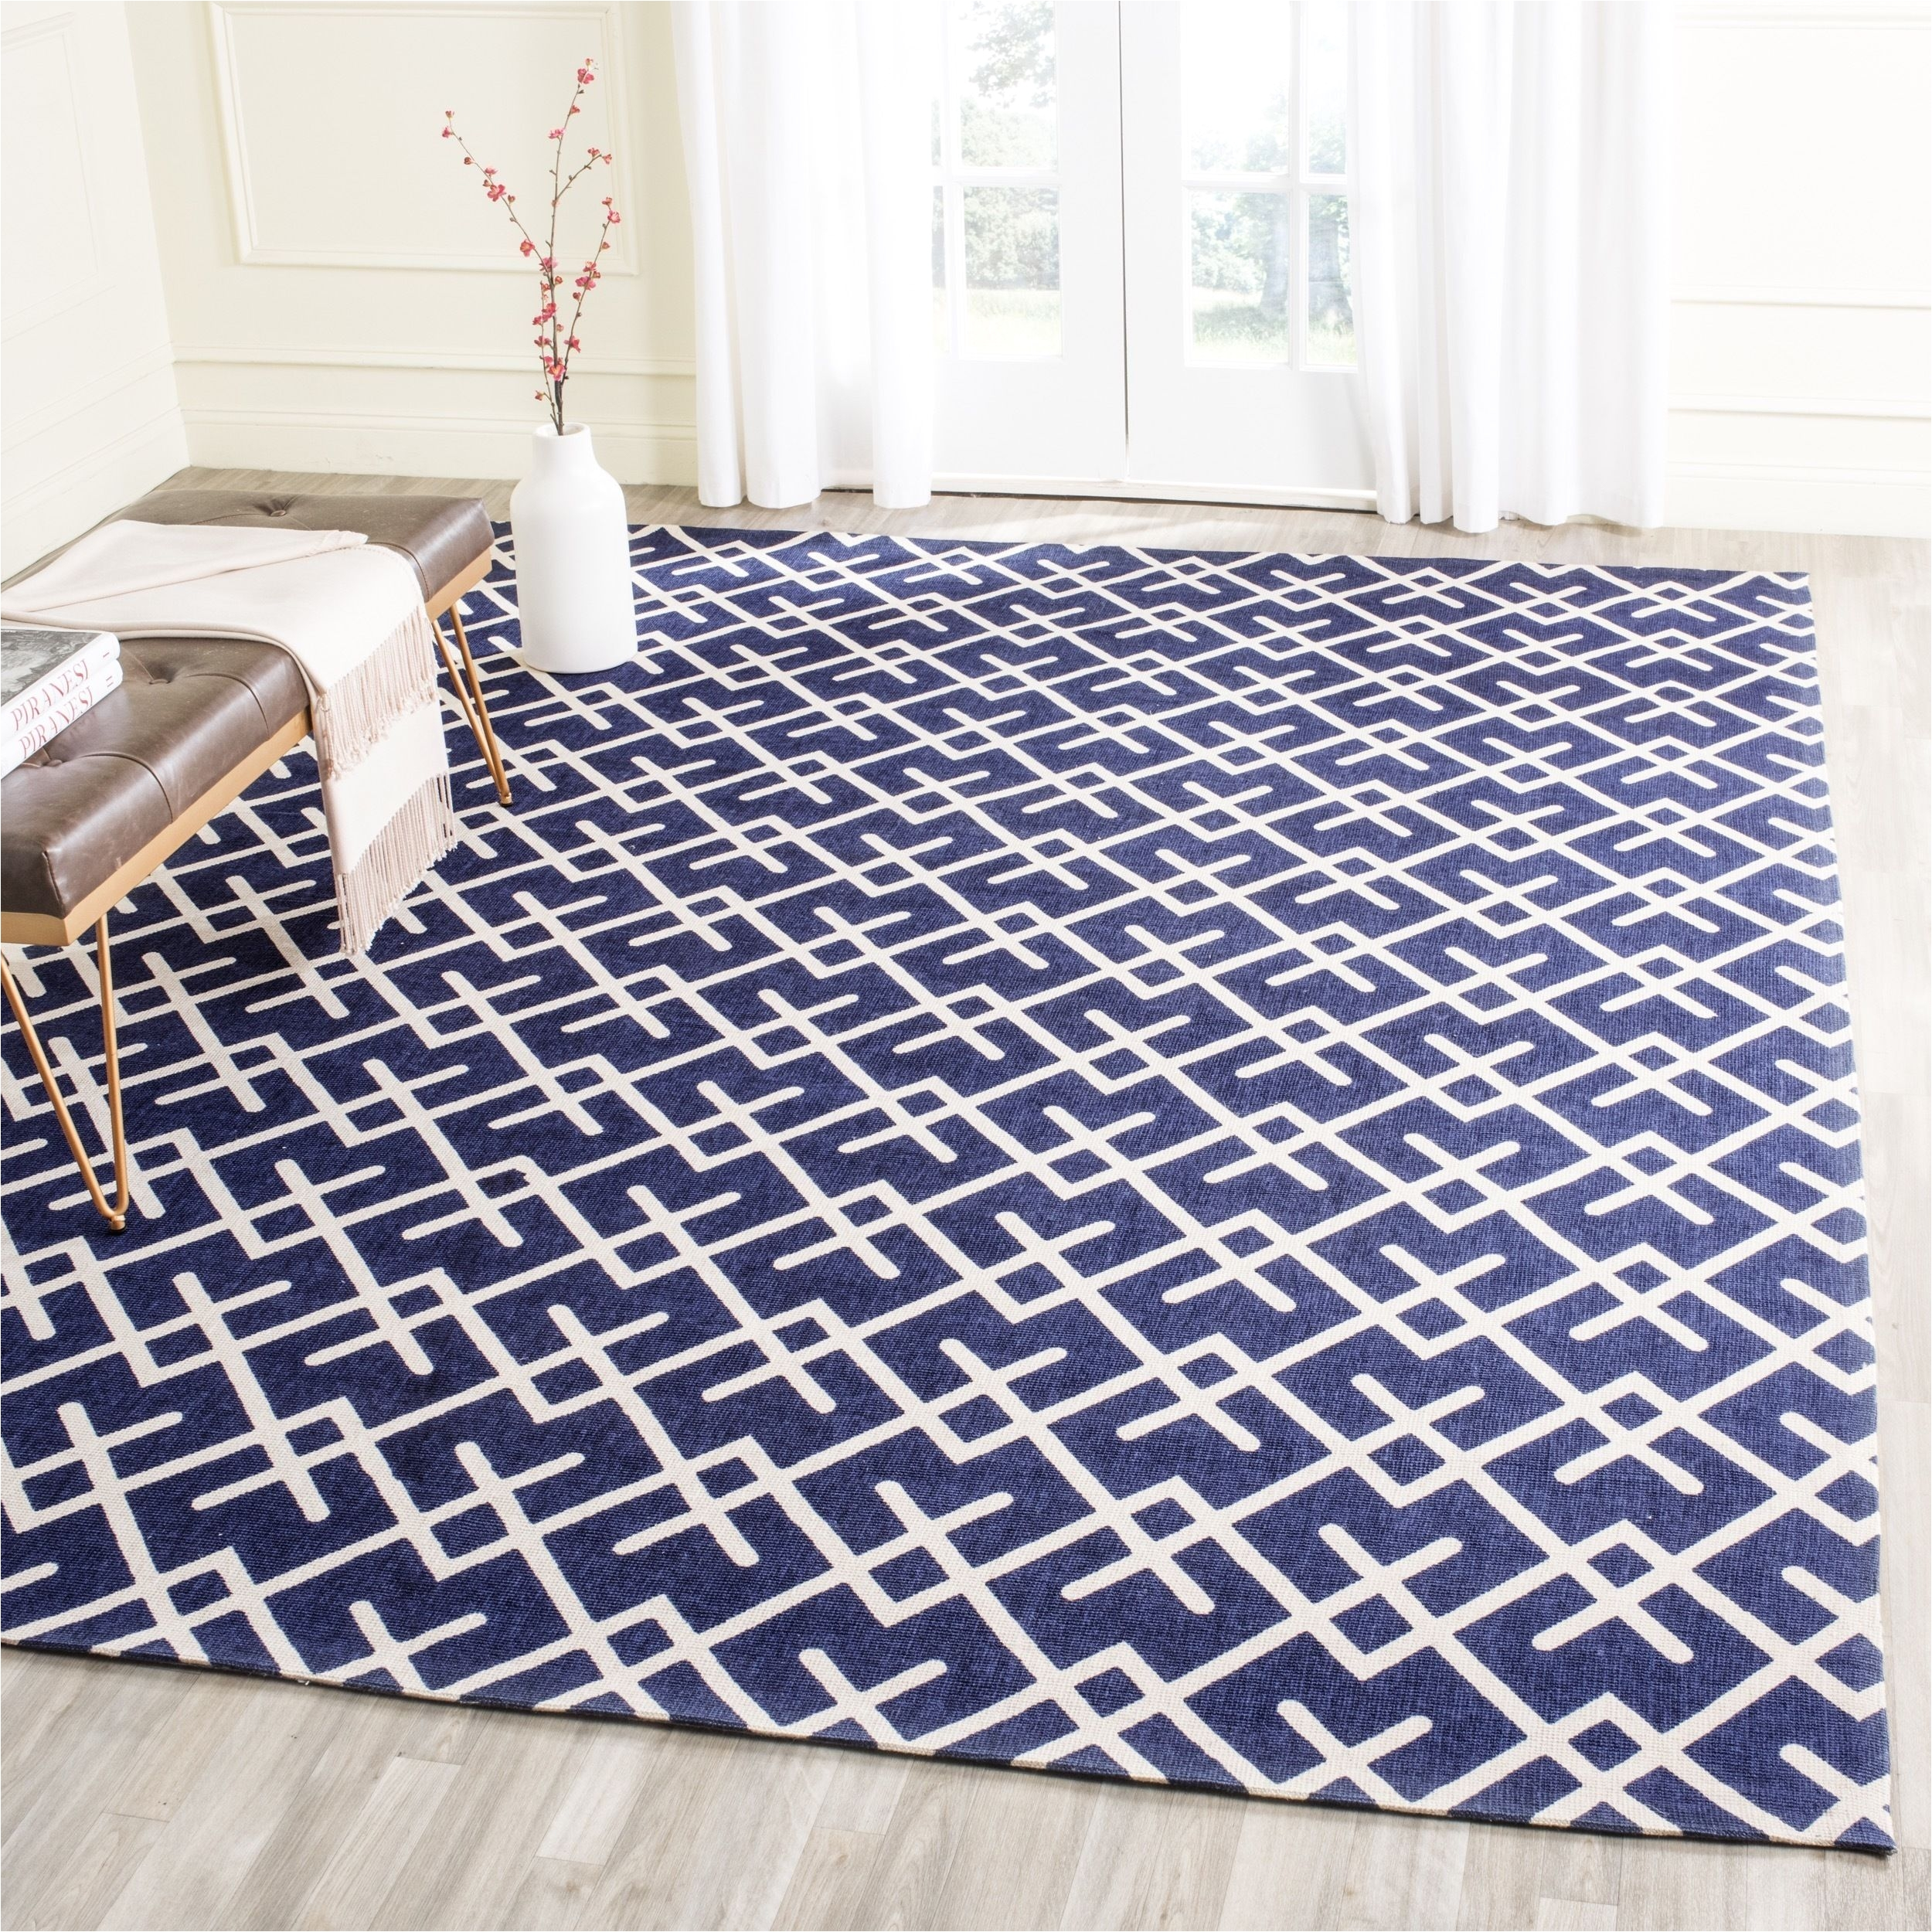 safavieh handmade cedar brook navy blue ivory jute rug 8 x